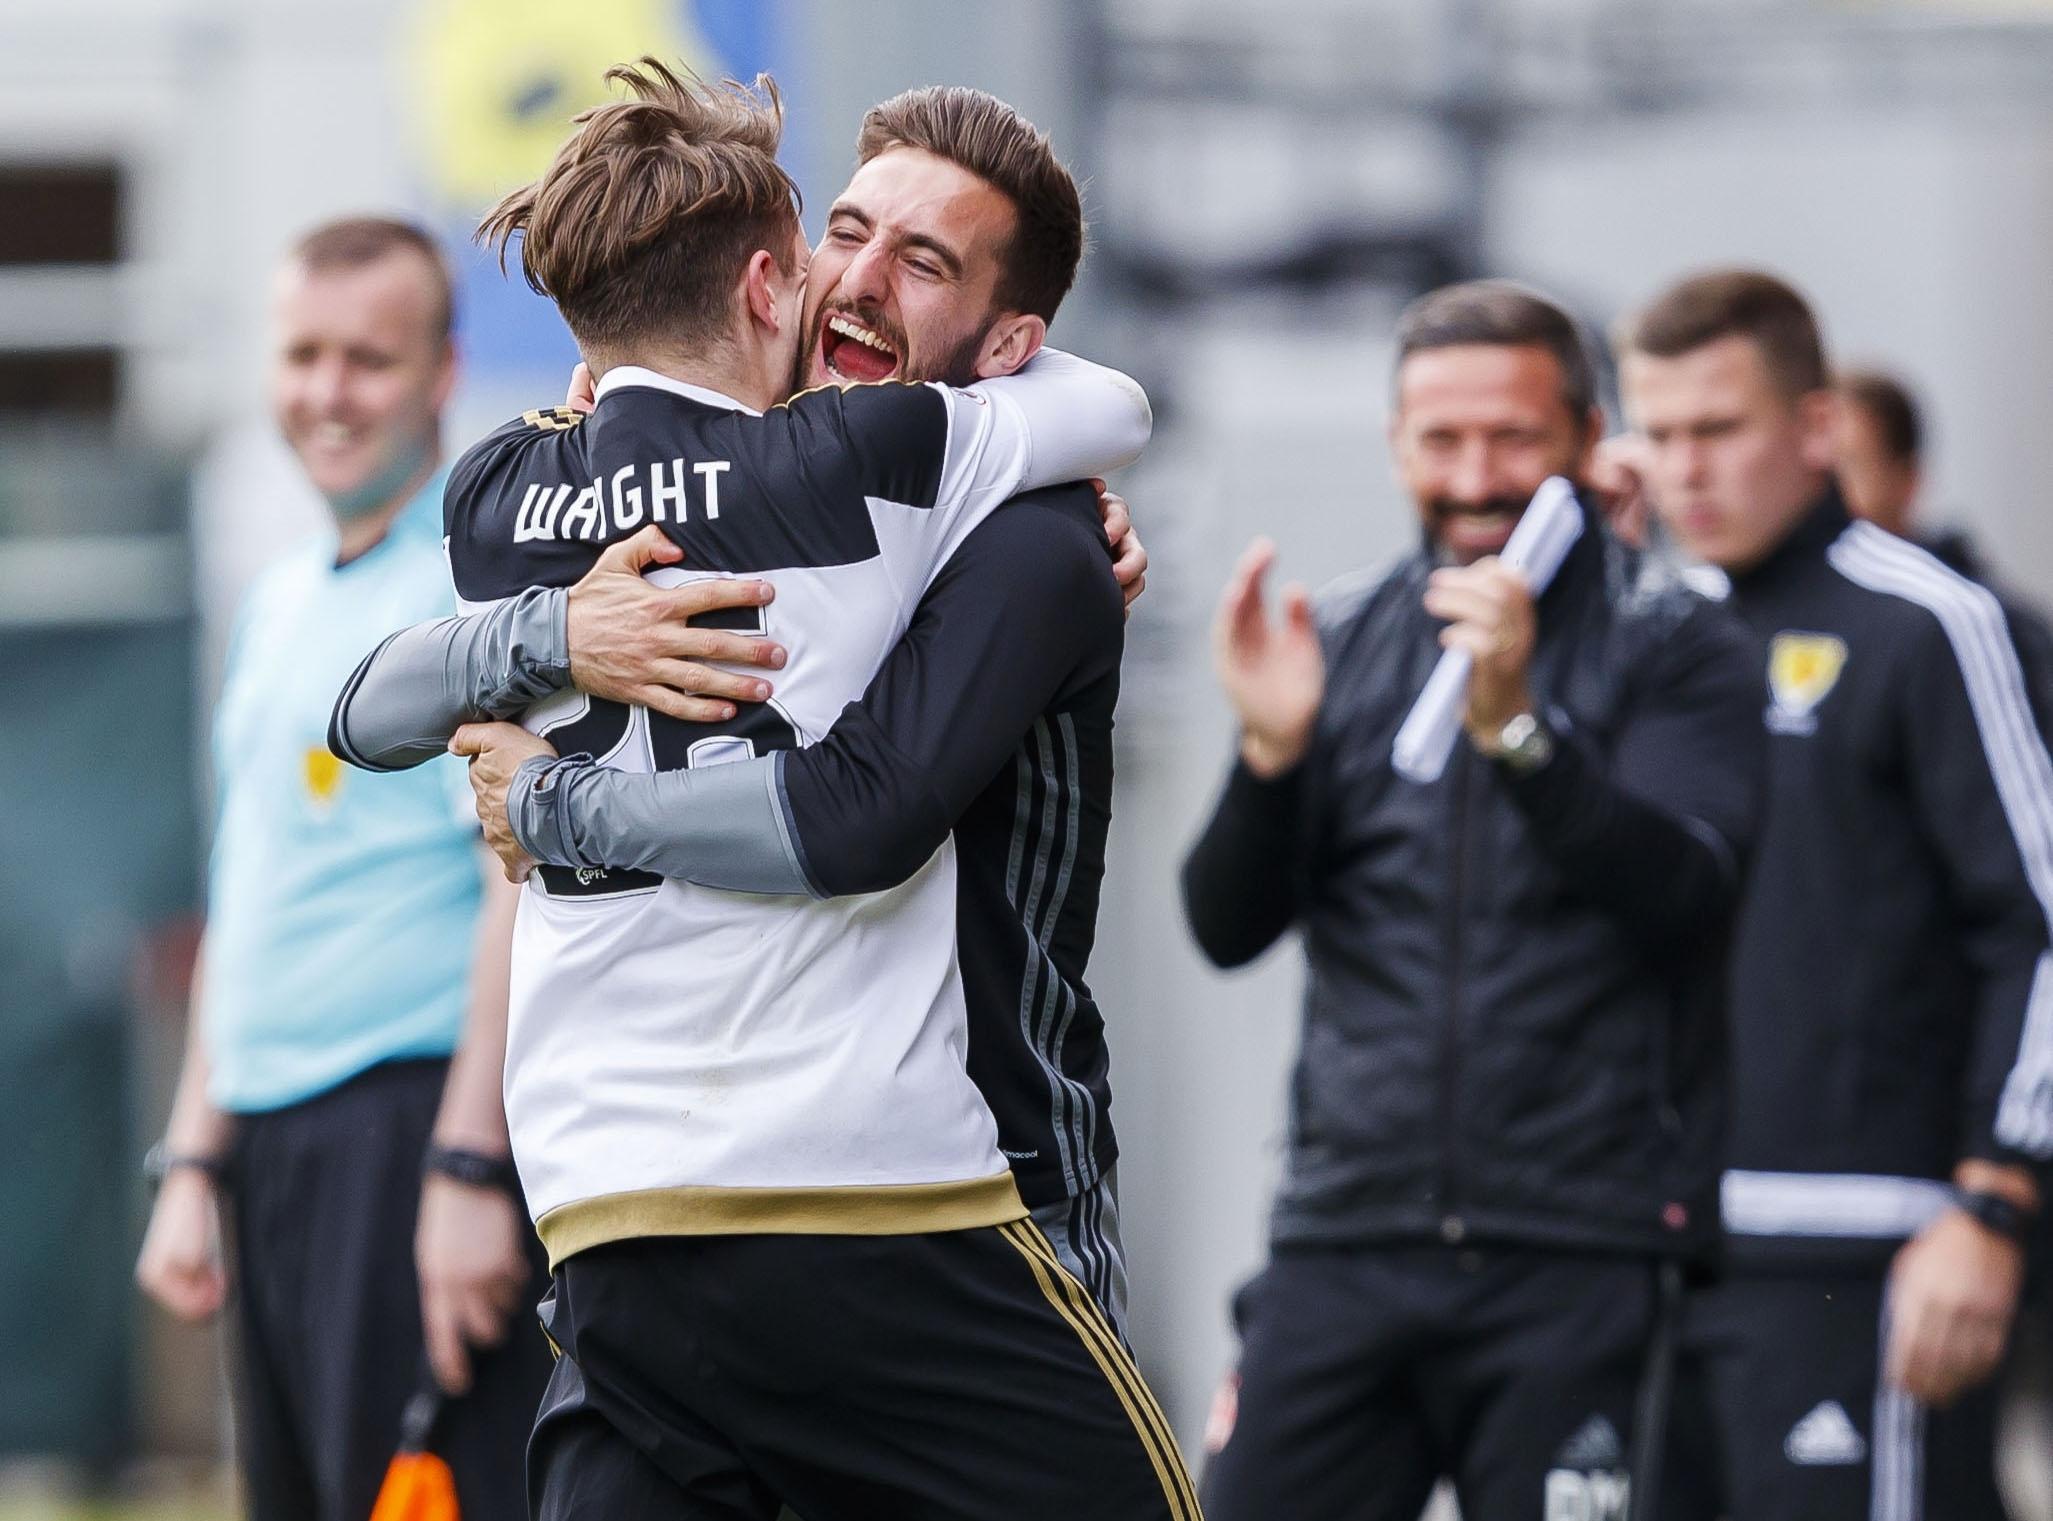 Aberdeen's Scott Wright (L) celebrates his goal with Graeme Shinnie